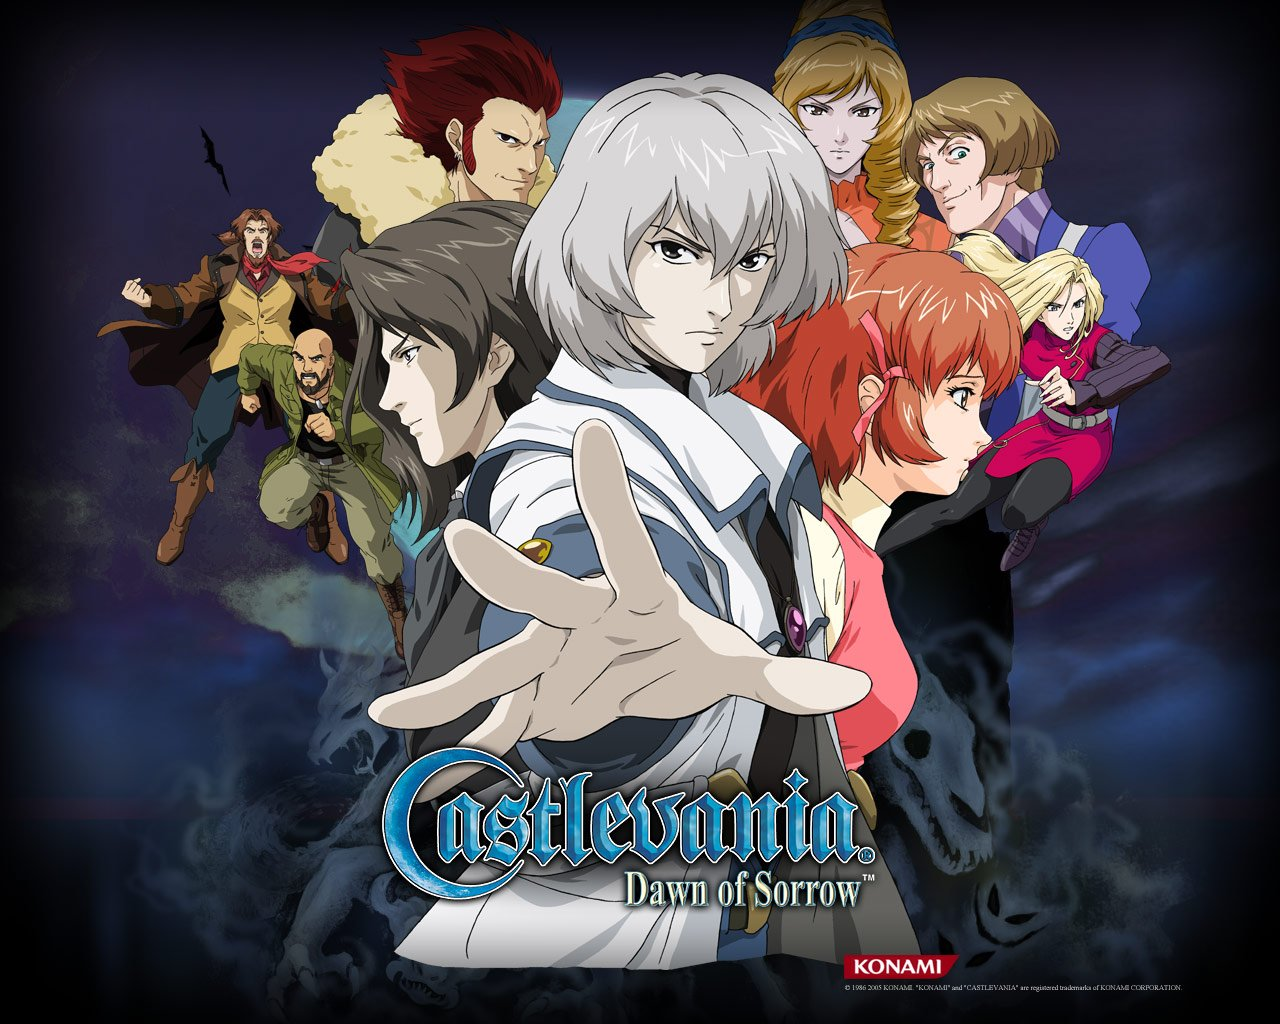 Castlevania Dawn Of Sorrow HD Wallpaper 7   1280 X 1024 stmednet 1280x1024